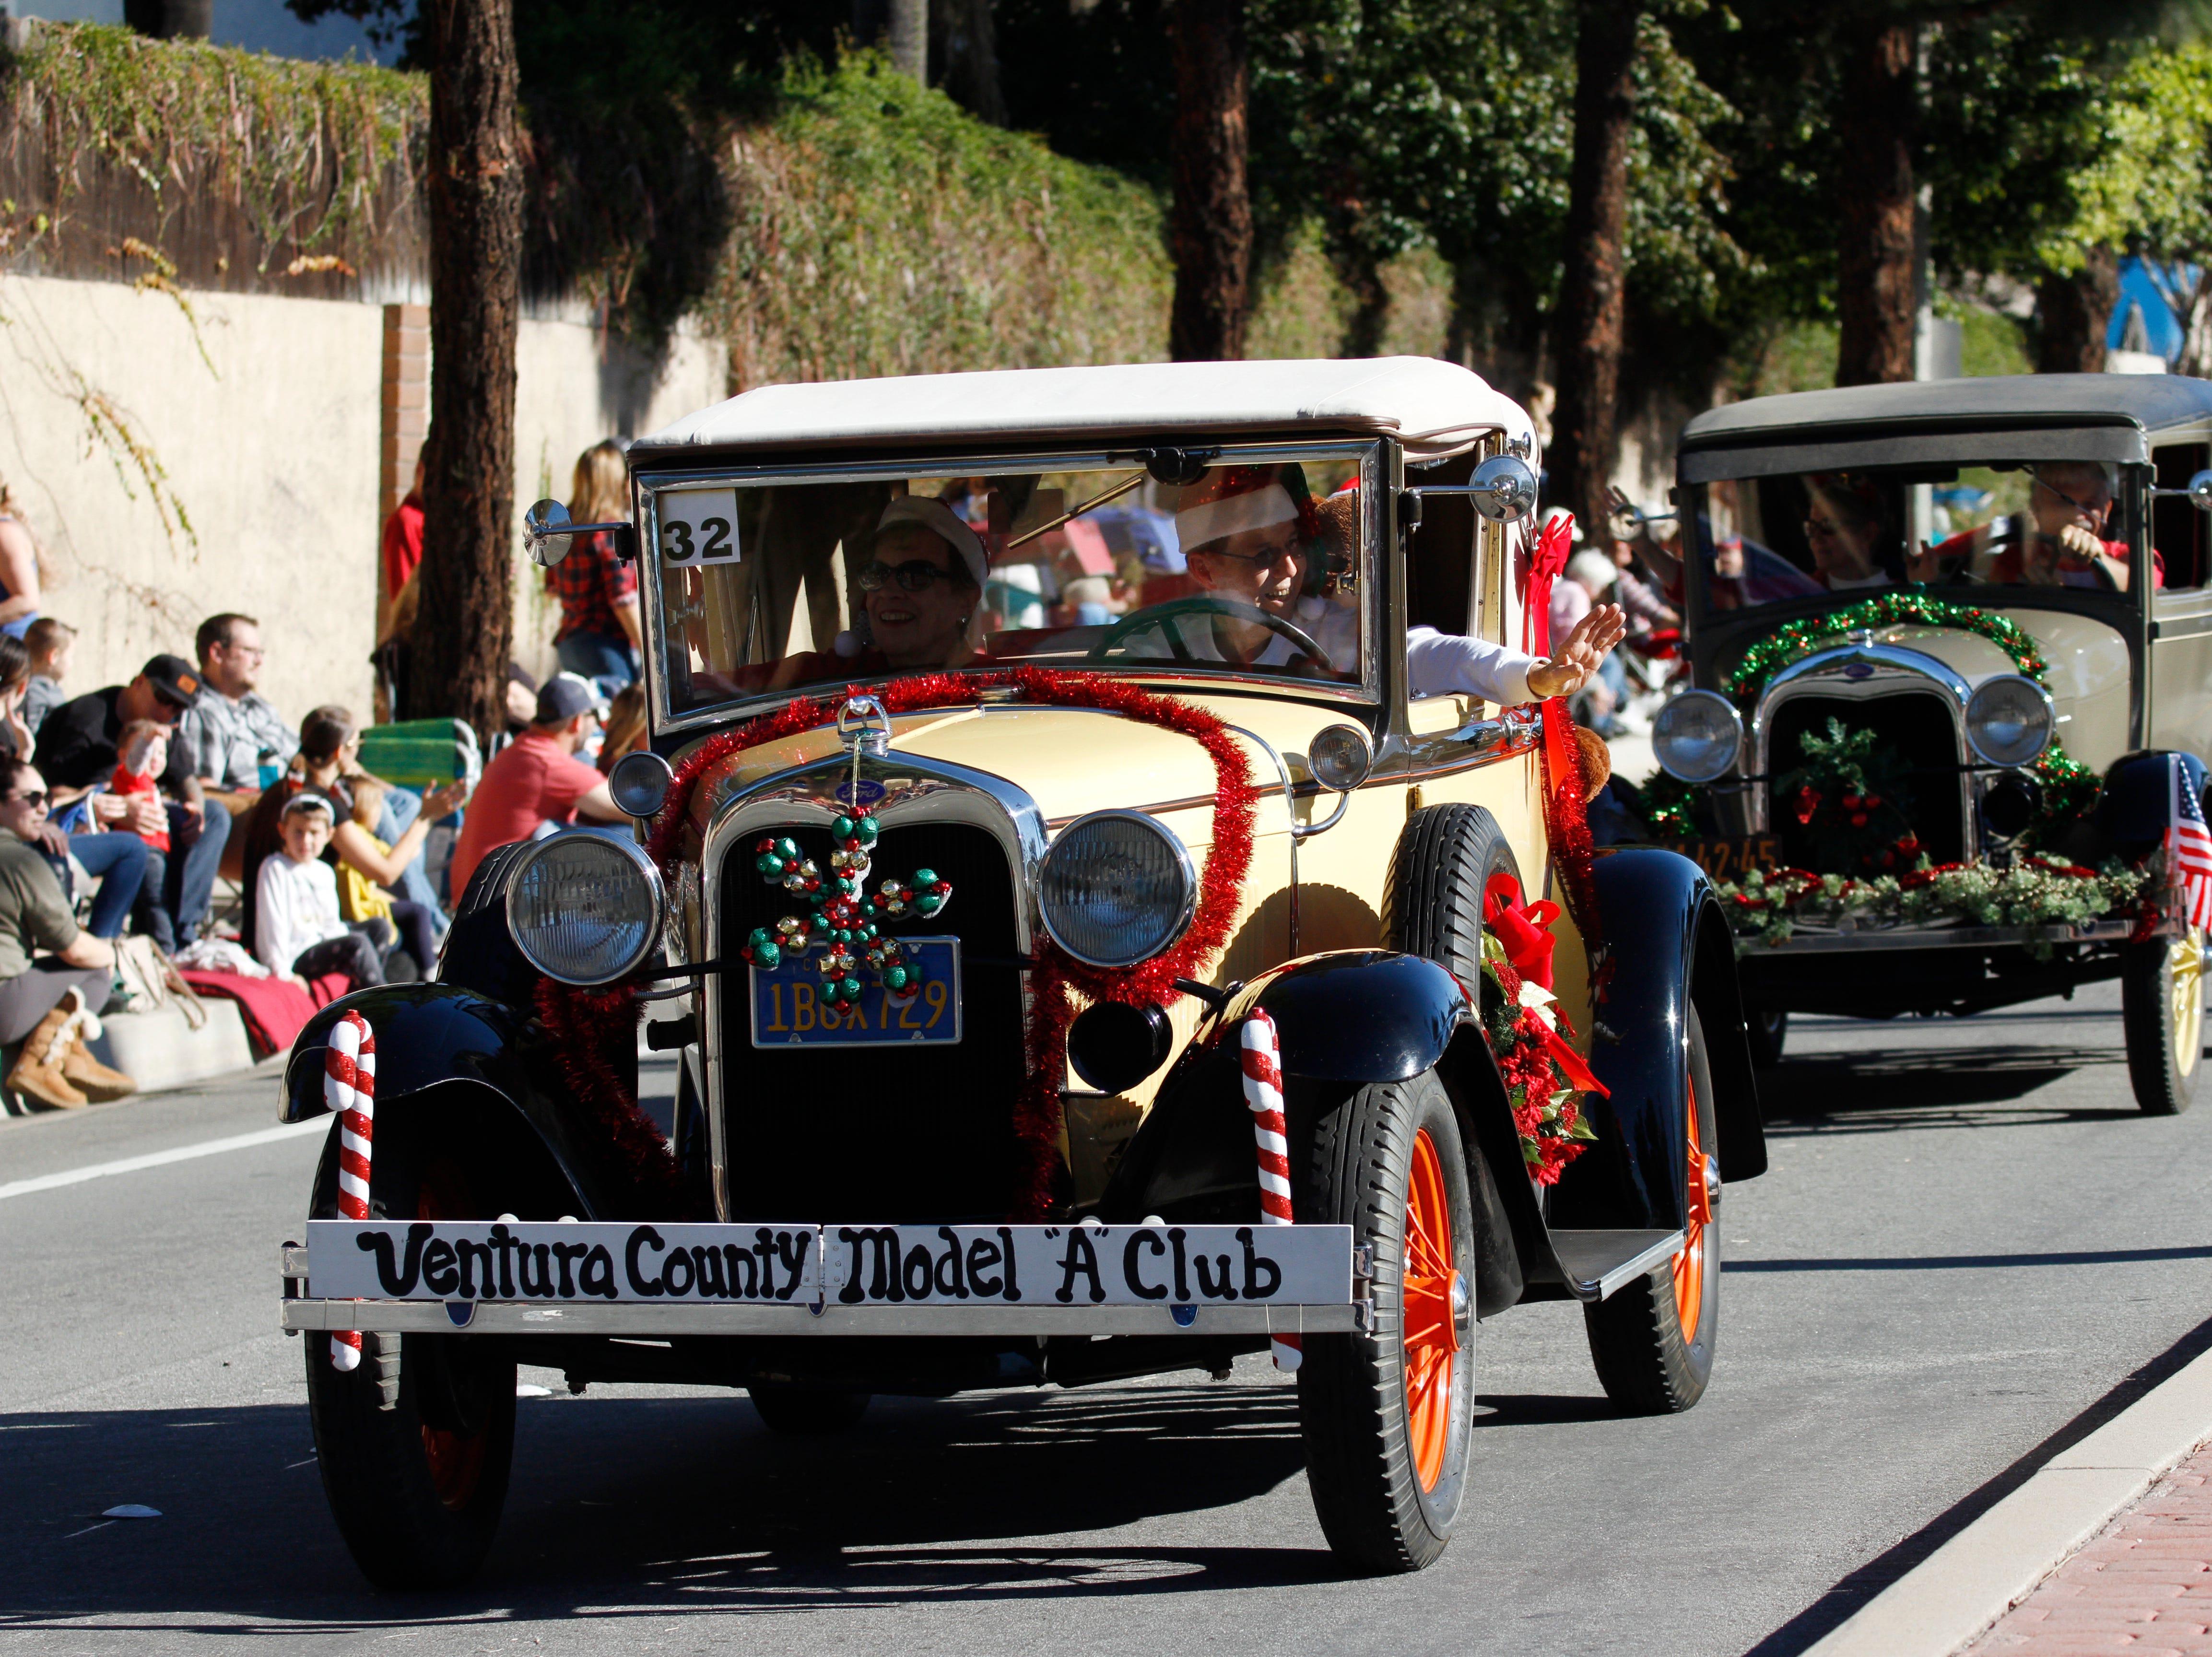 The Ventura County Model A Club participates in Saturday's Camarillo Christmas parade.